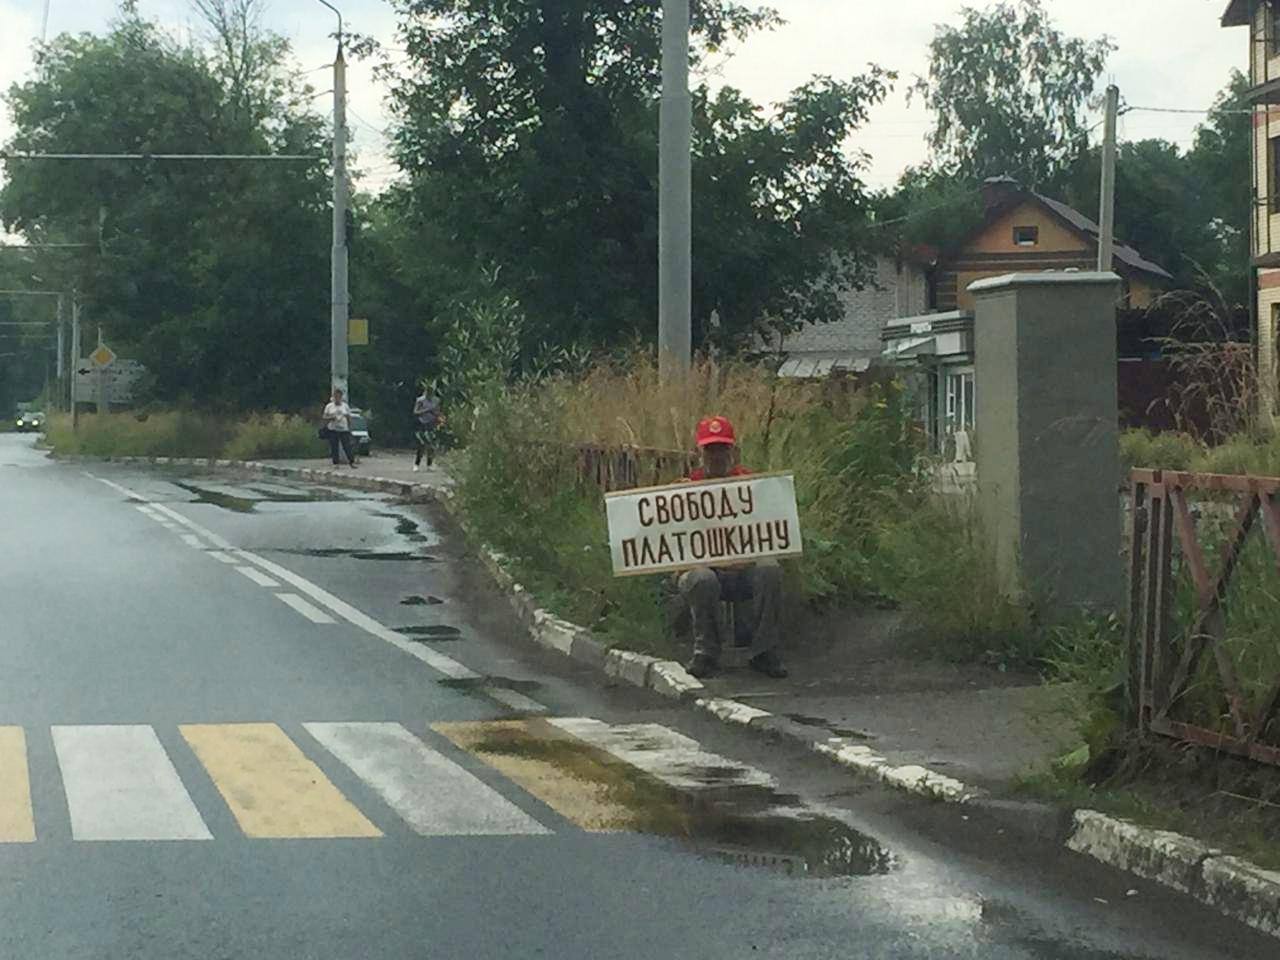 Свободу Николаю Платошкину!